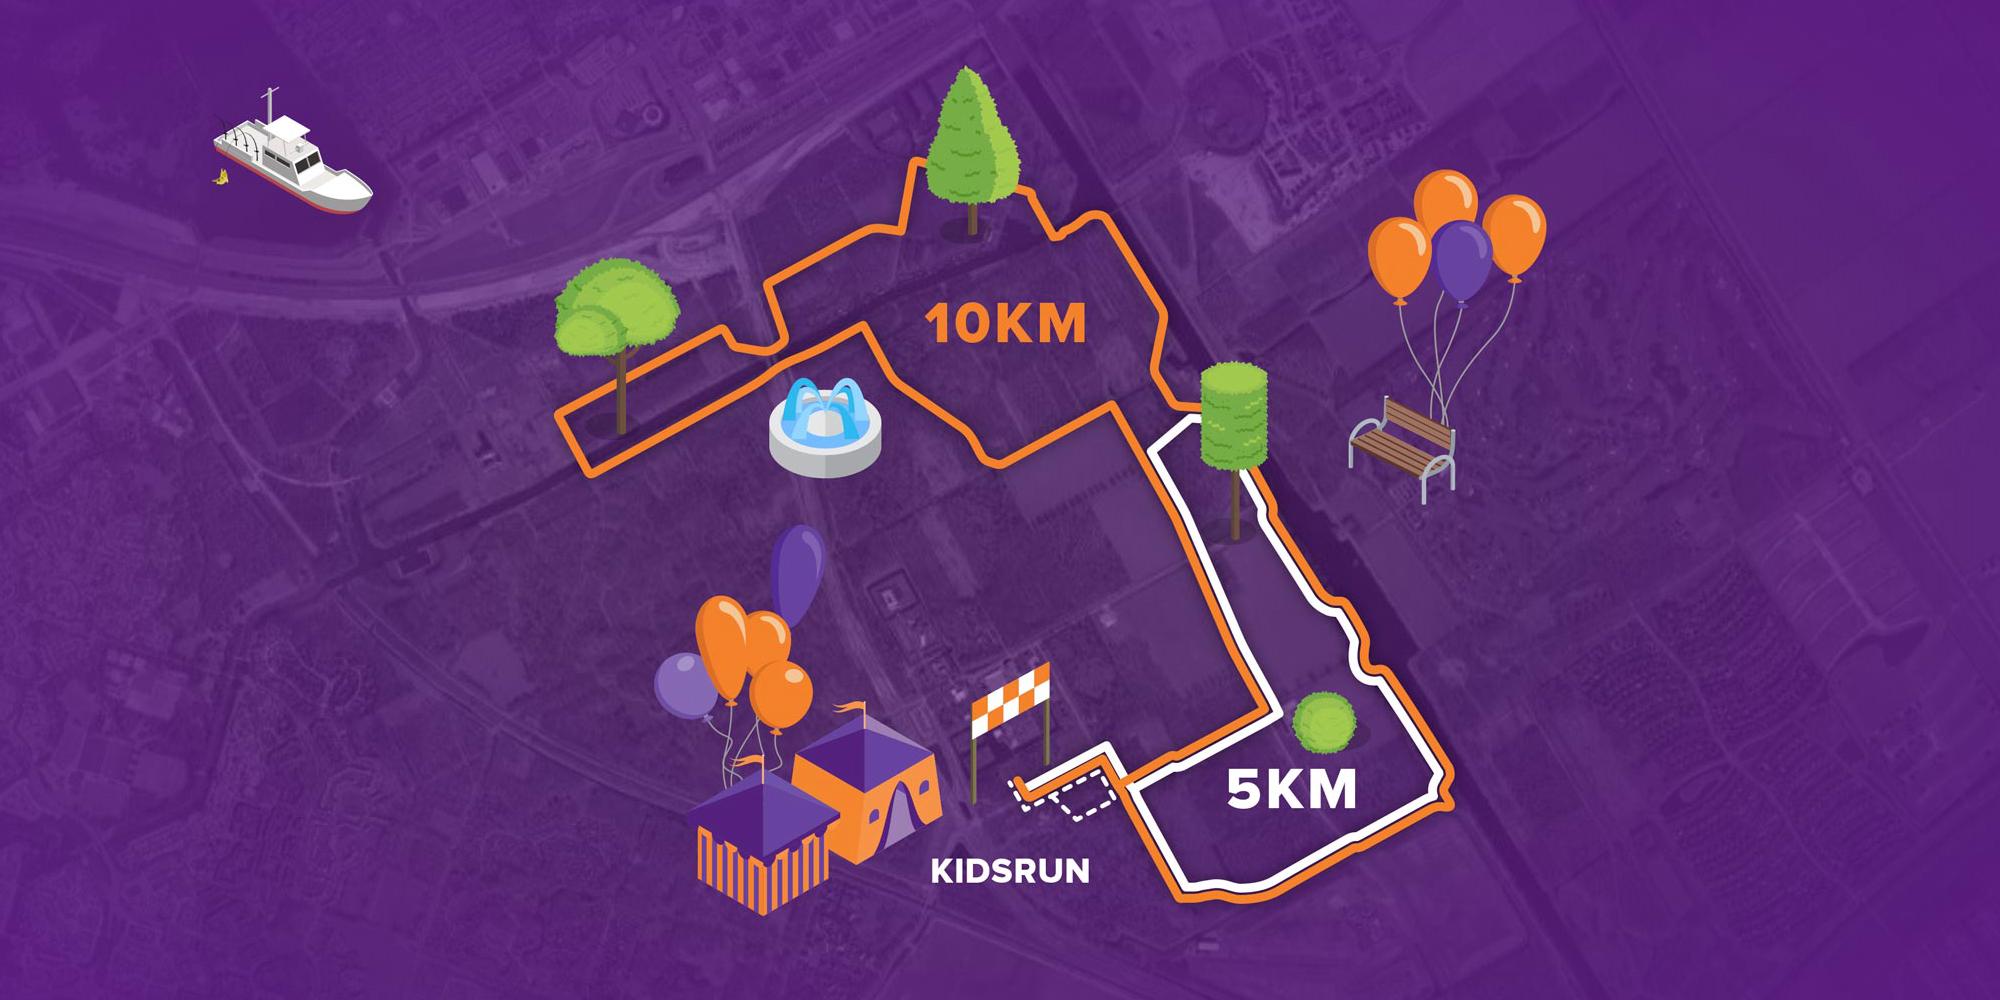 Afbeelding van de 10 kilometer, 5 kilometer en 1 kilometer KidsRun route van Run for KiKa Almere op 26 mei 2019 op de Kemphaan in Almere